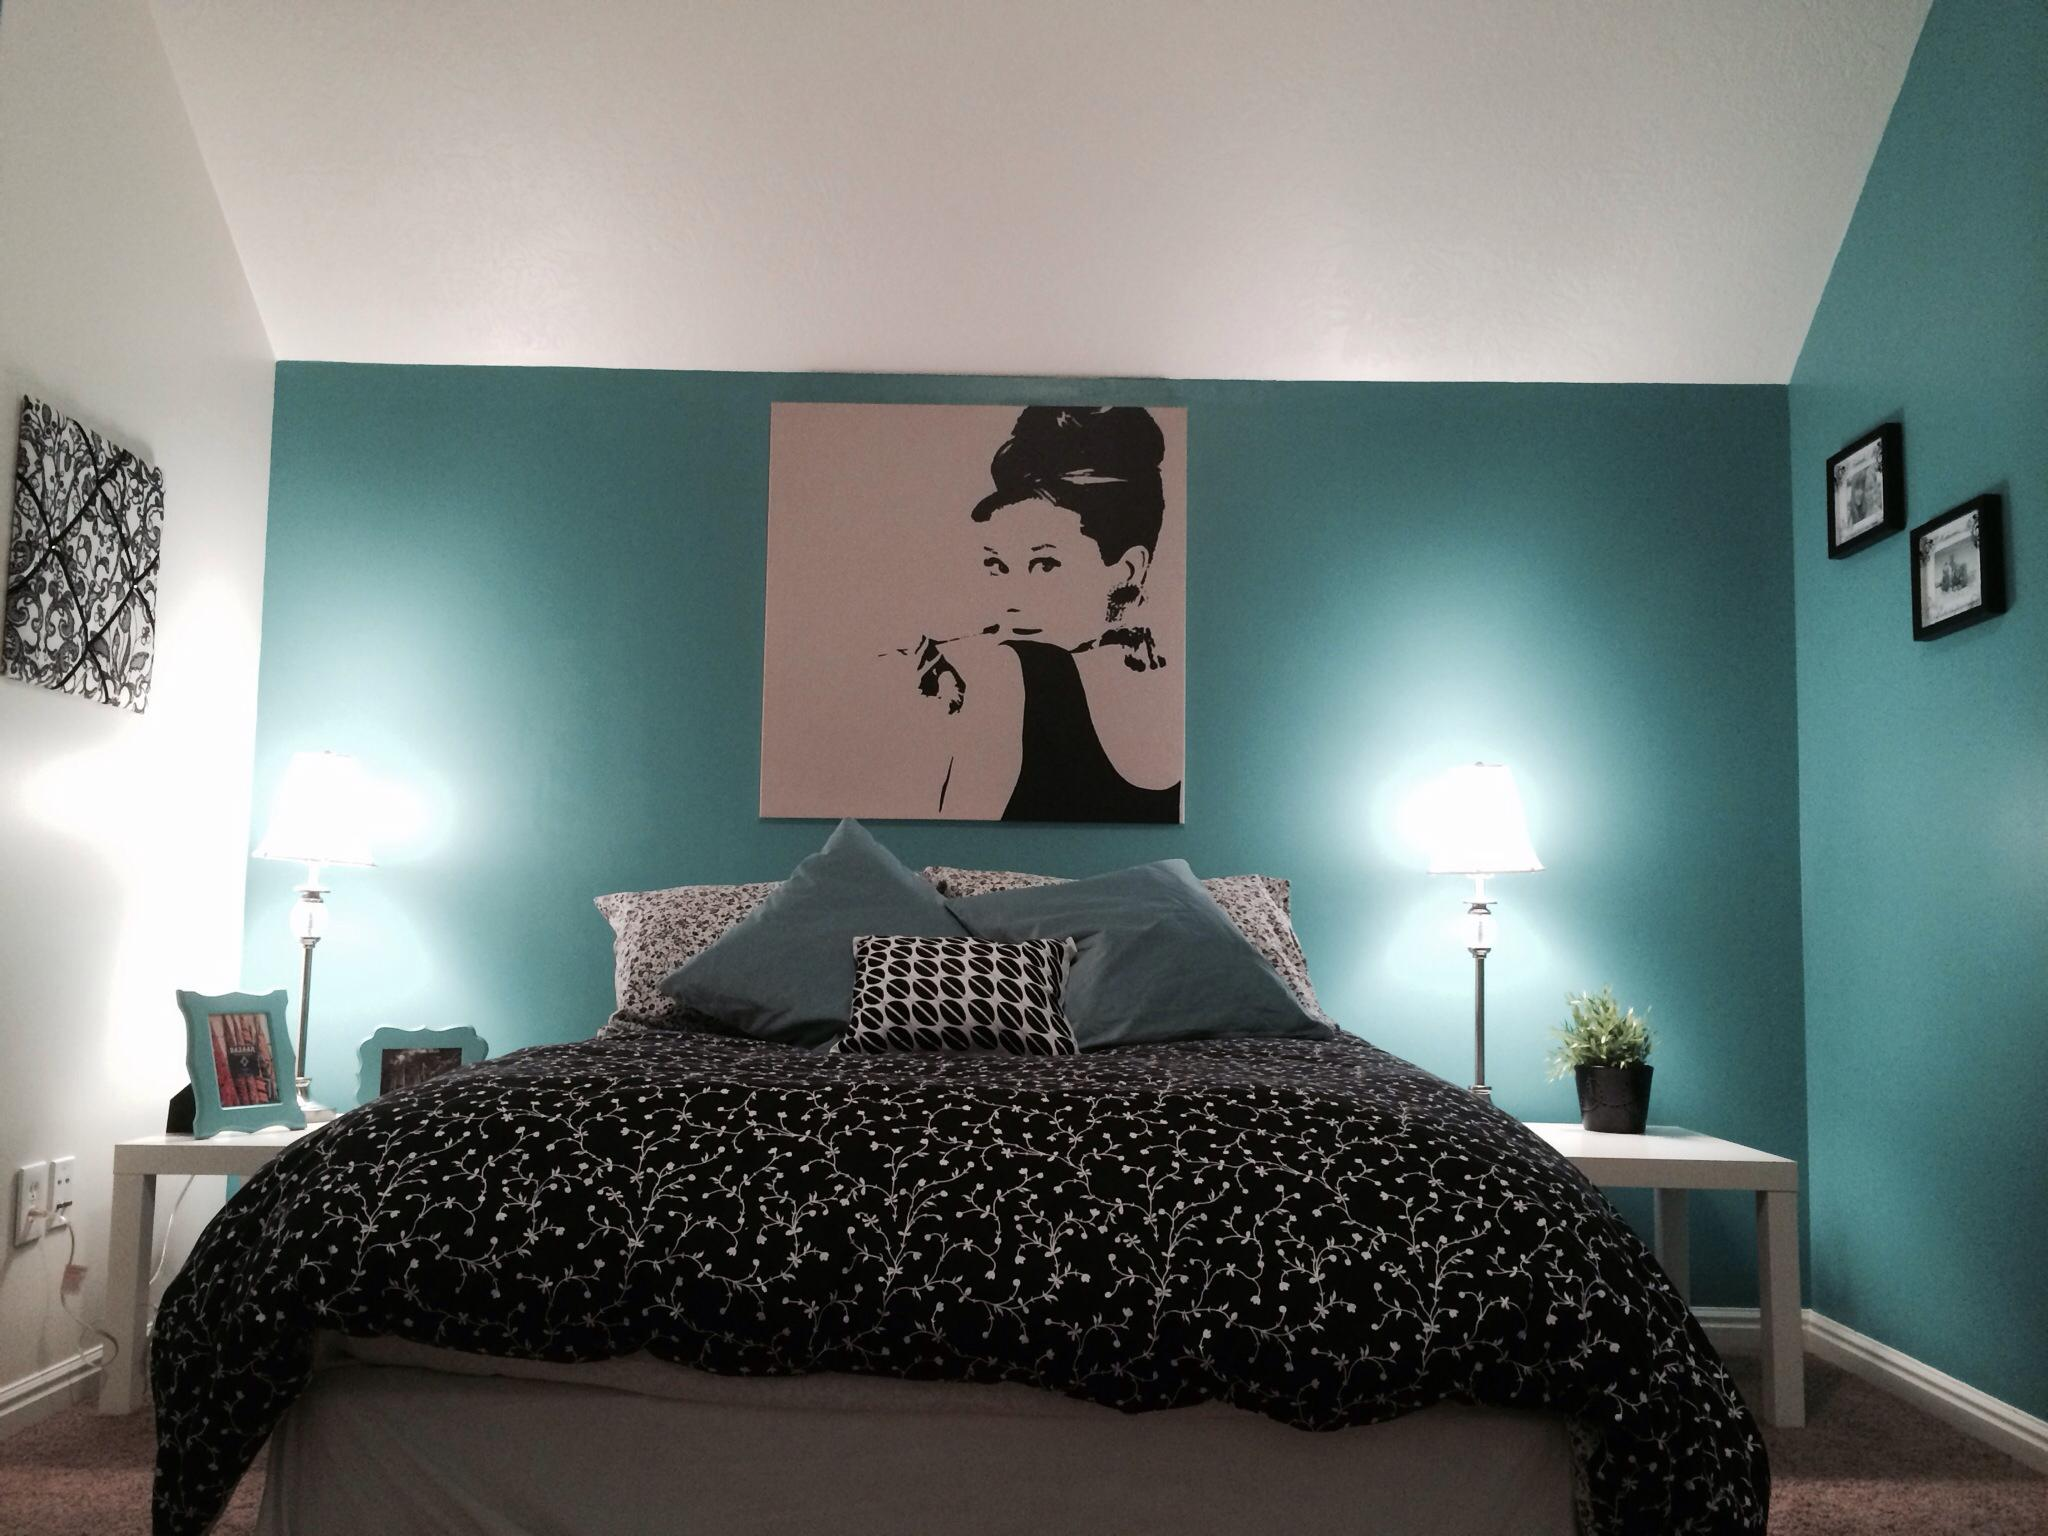 61 quartos azul turquesa tiffany fotos lindas - Entrancing images of blue and black bedroom decoration ideas ...